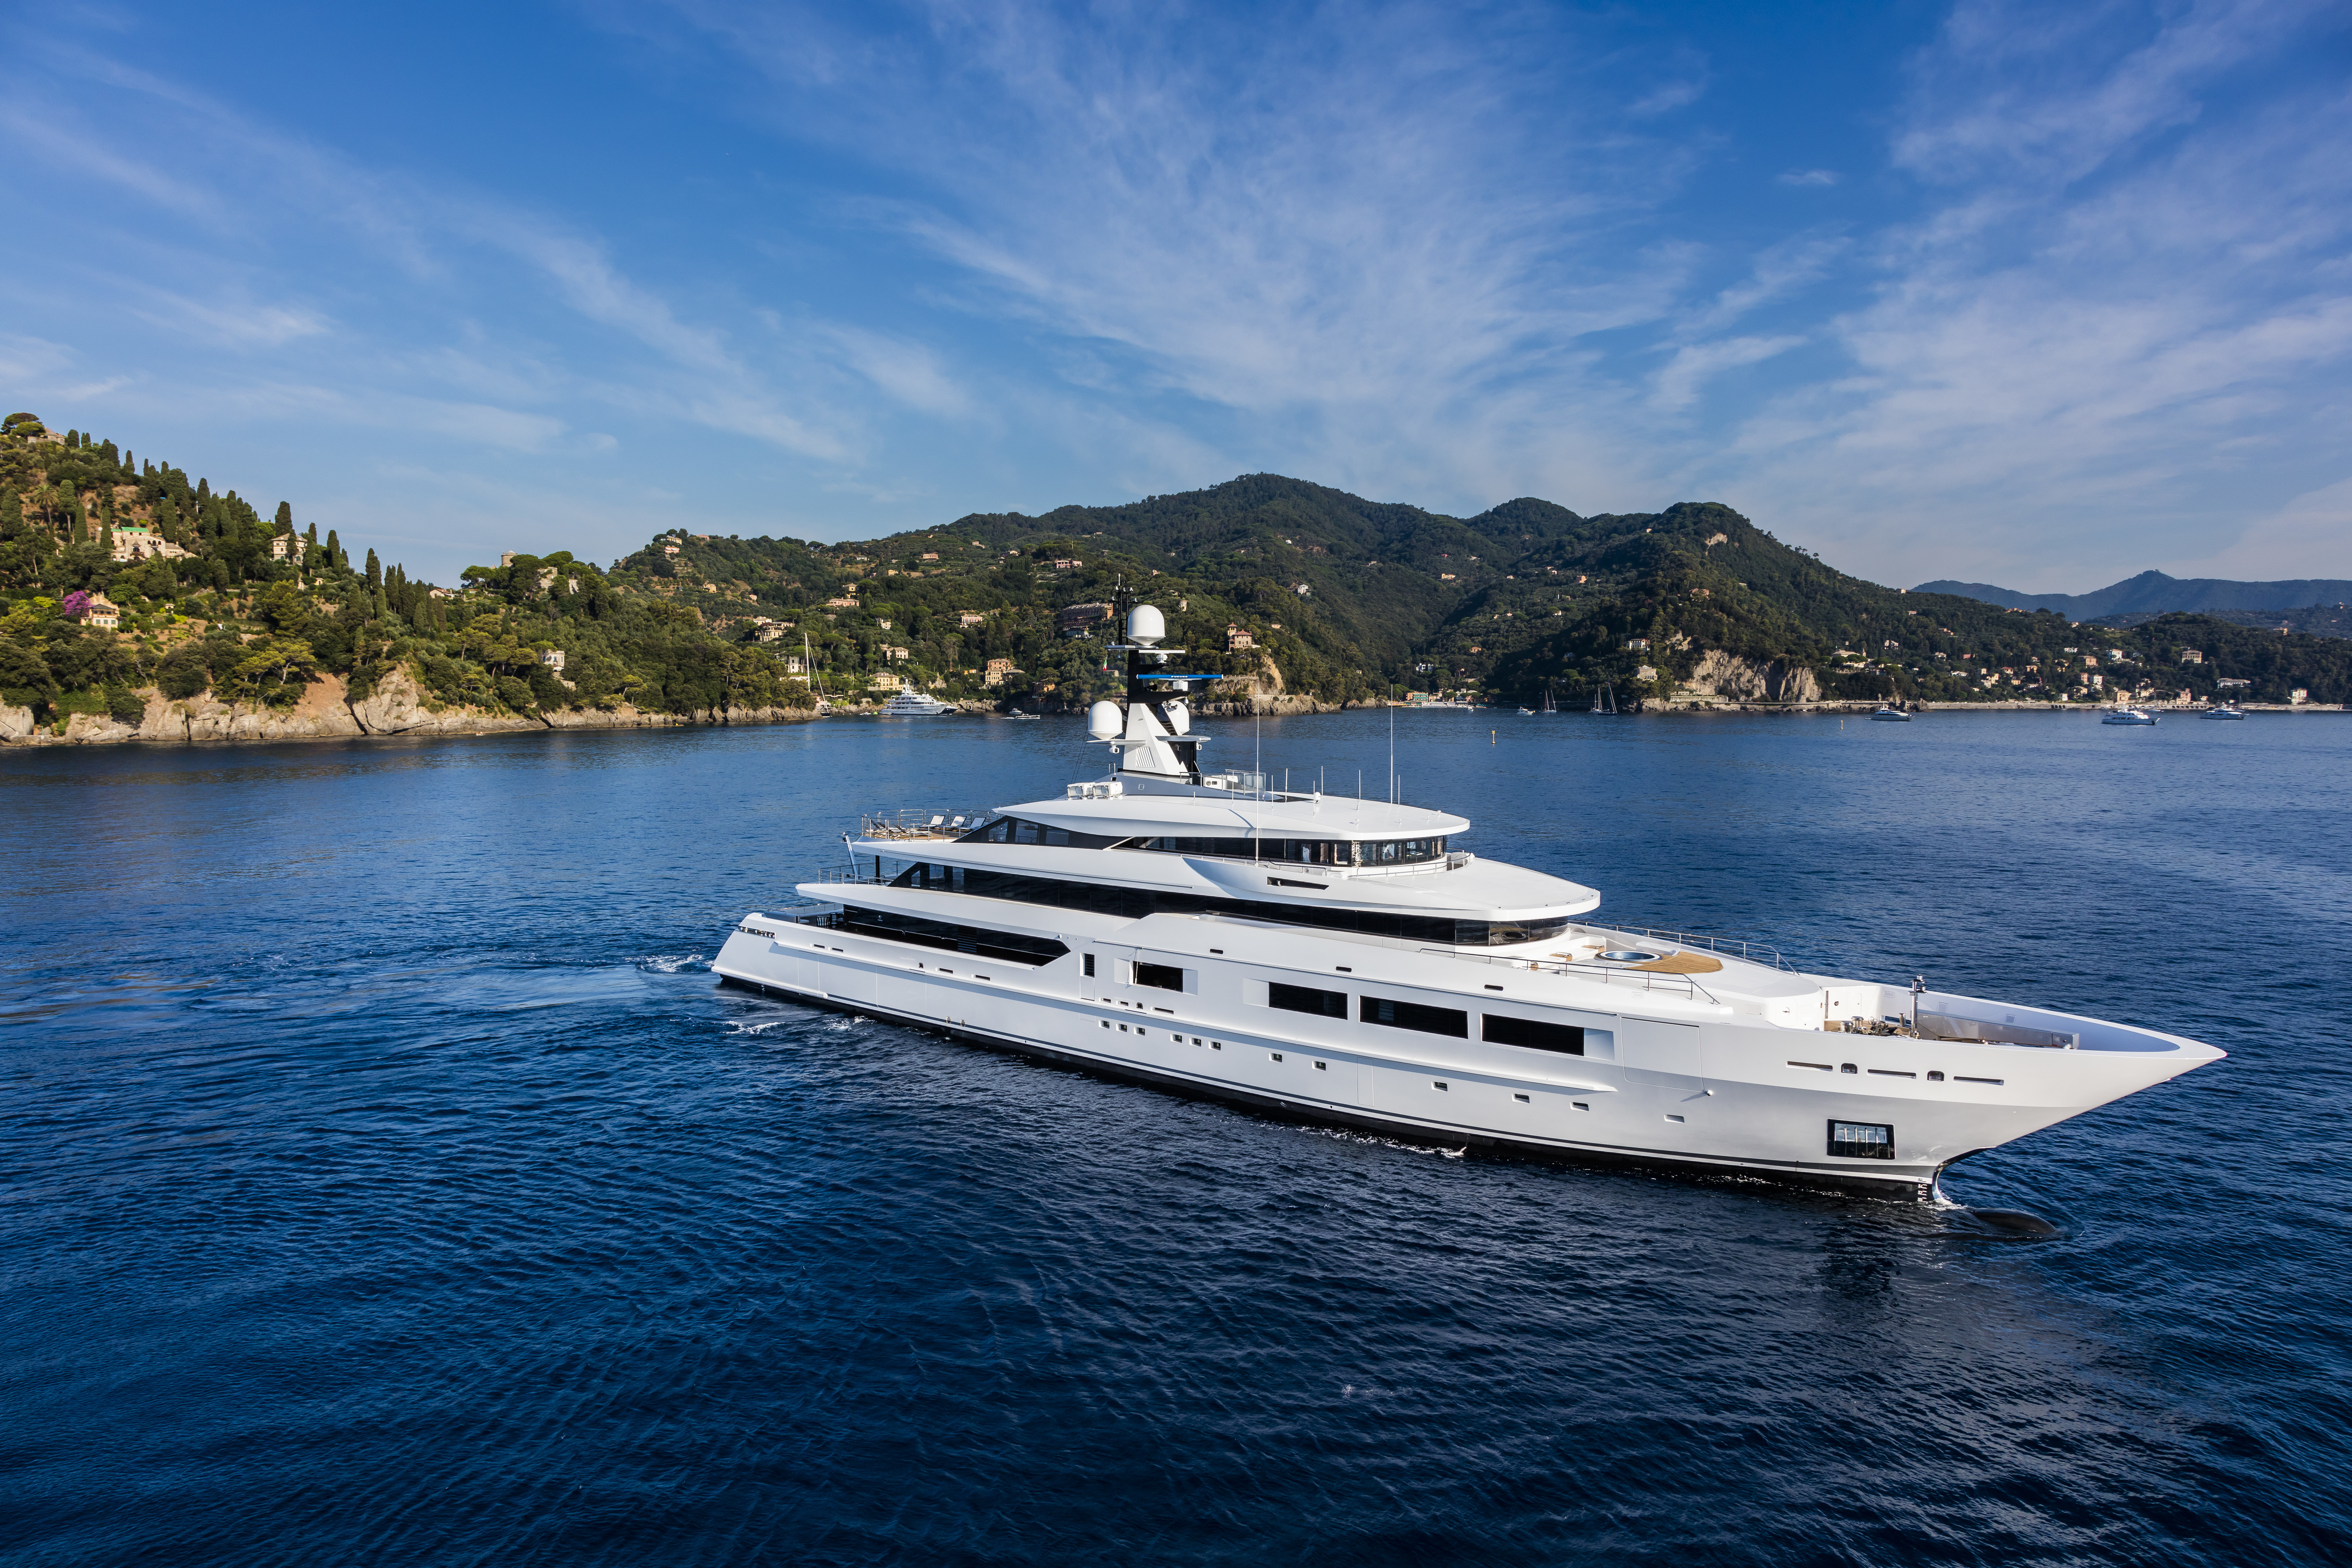 Tankoa Yachts 69 Metre Superyacht Suerte - Portofino And The Riviera